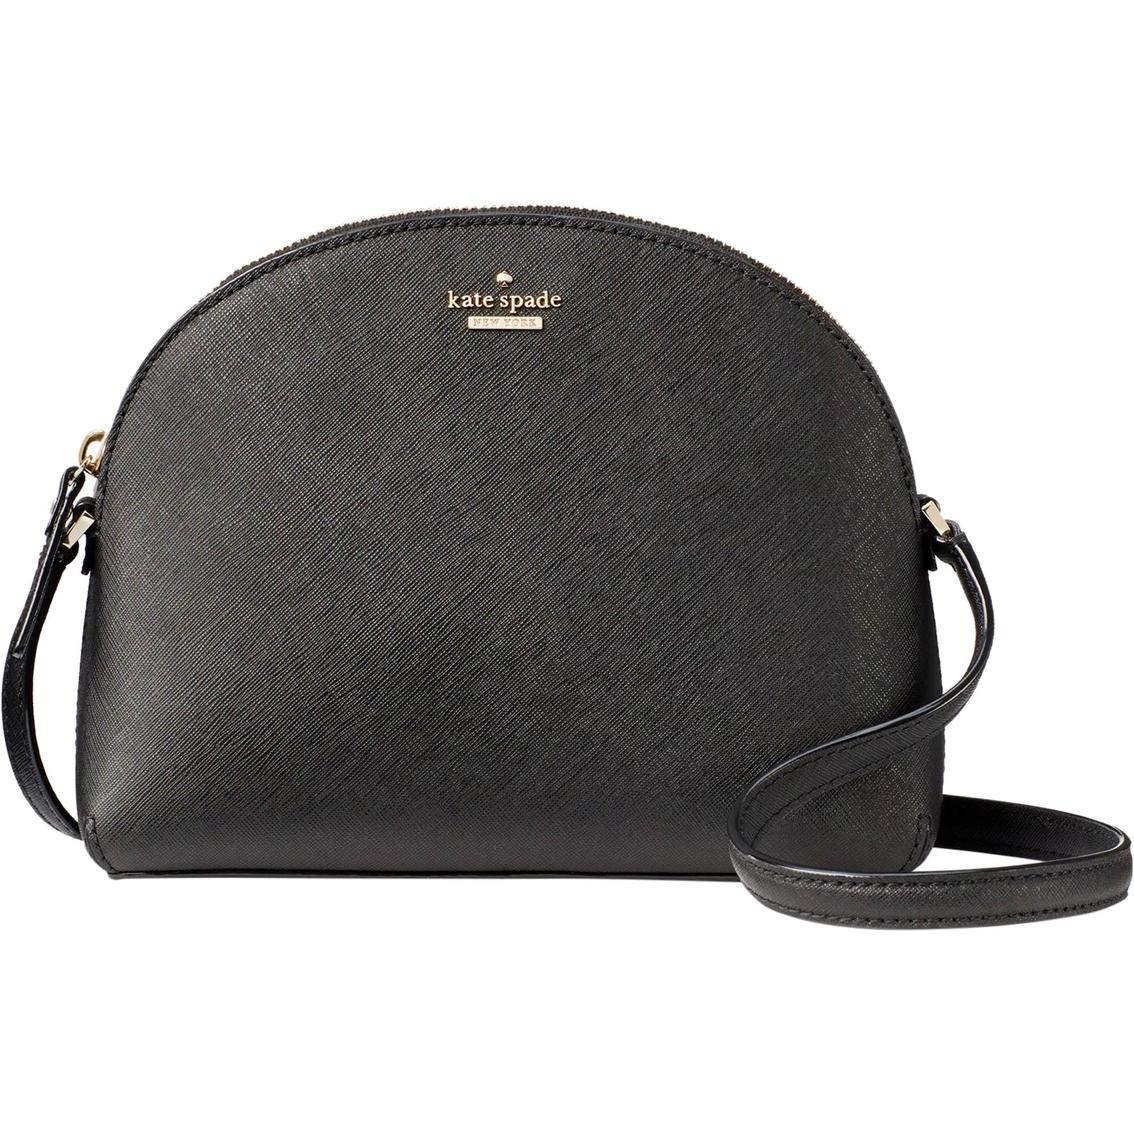 Kate Spade New York Cameron Street Large Hilli Crossbody Handbag ... f20b487959a38